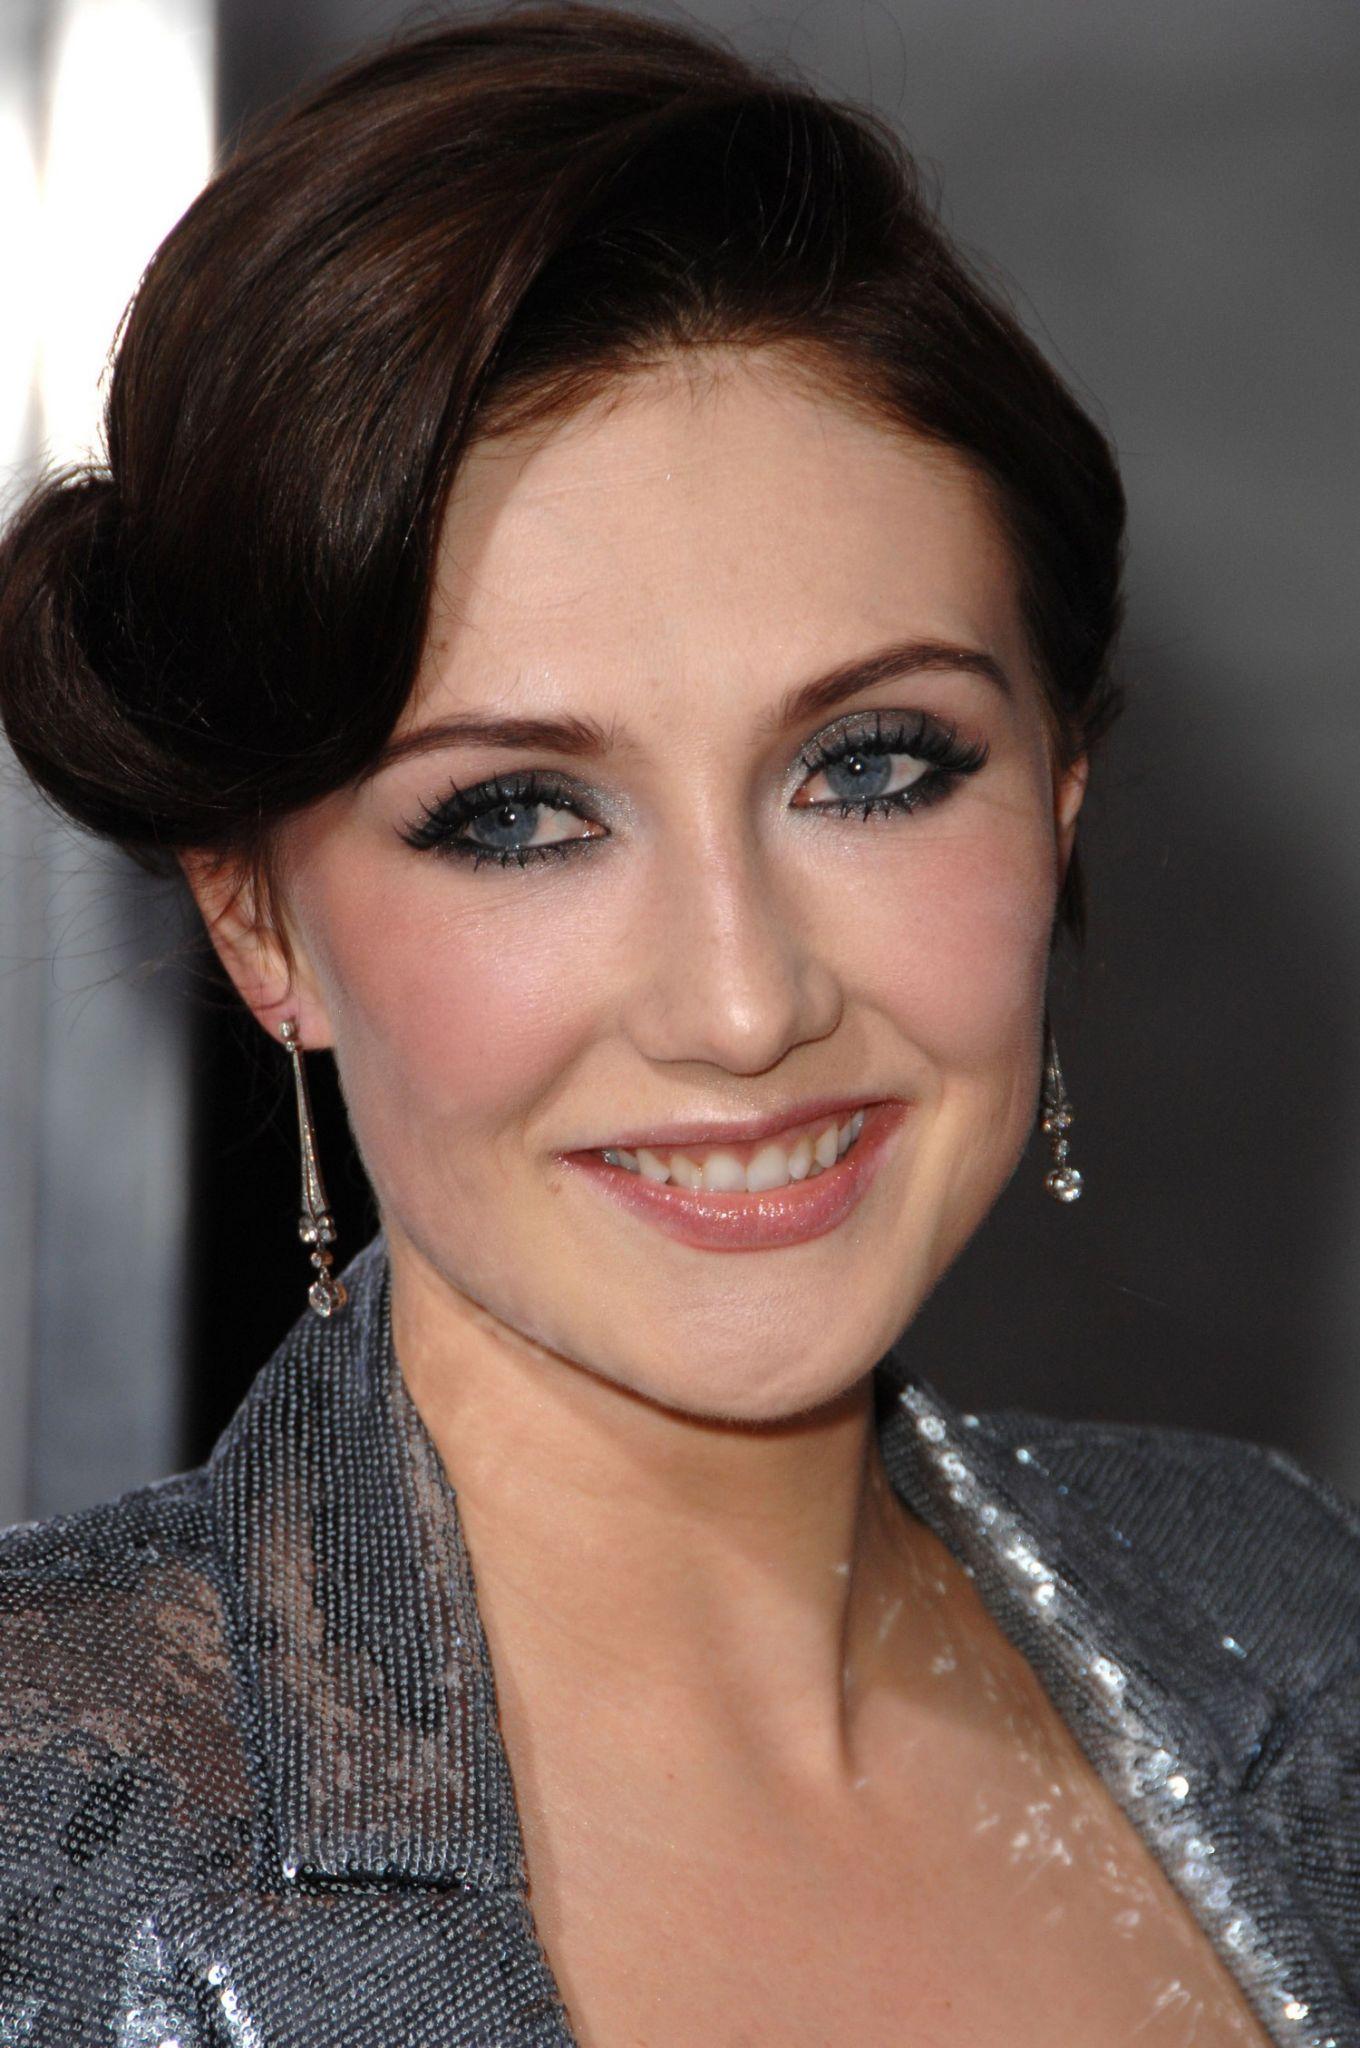 Carice van Houten - Wikipedia